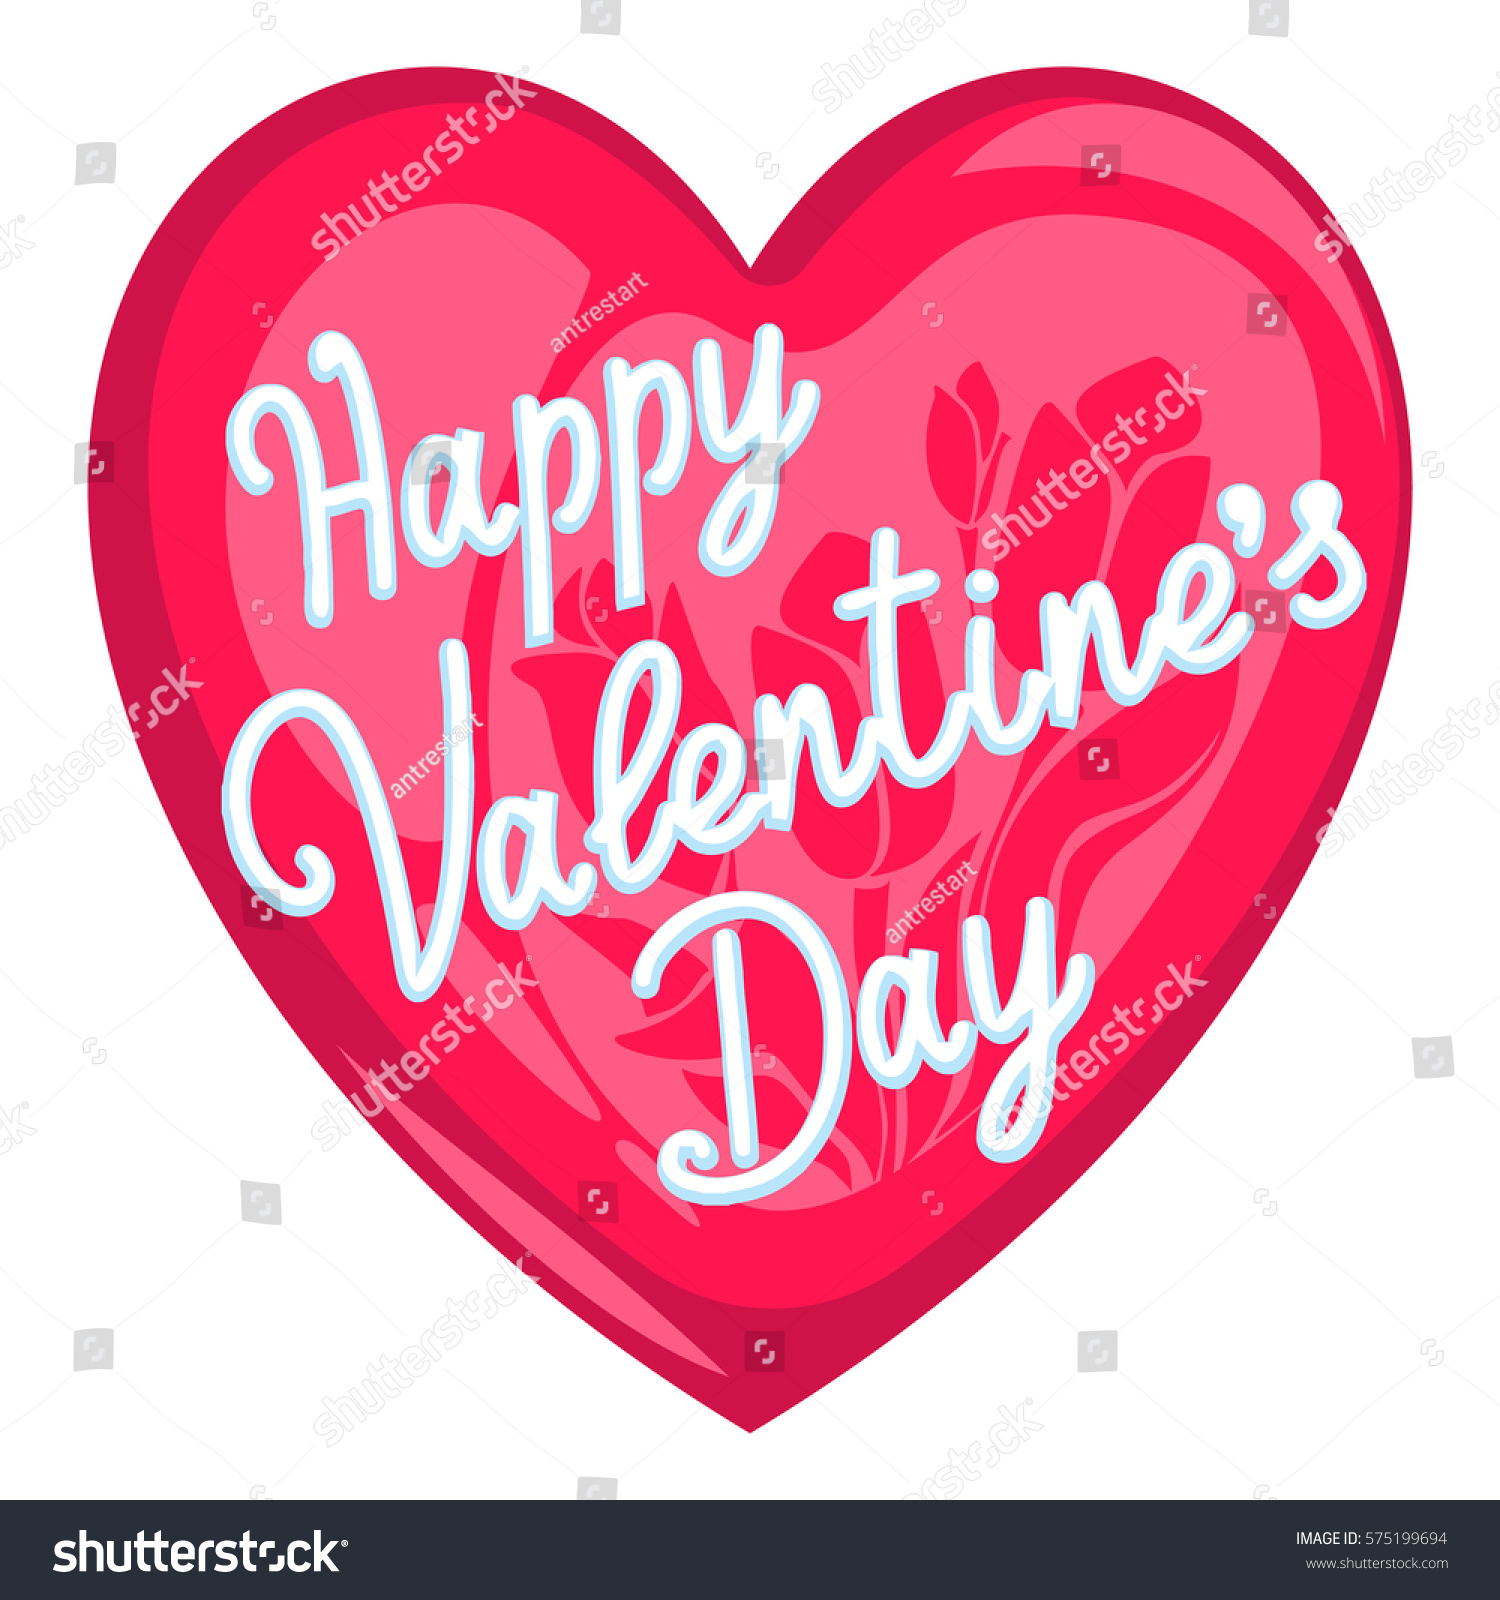 Happy Valentines Day Cartoon Vector Heart Stock Vector Royalty Free 575199694